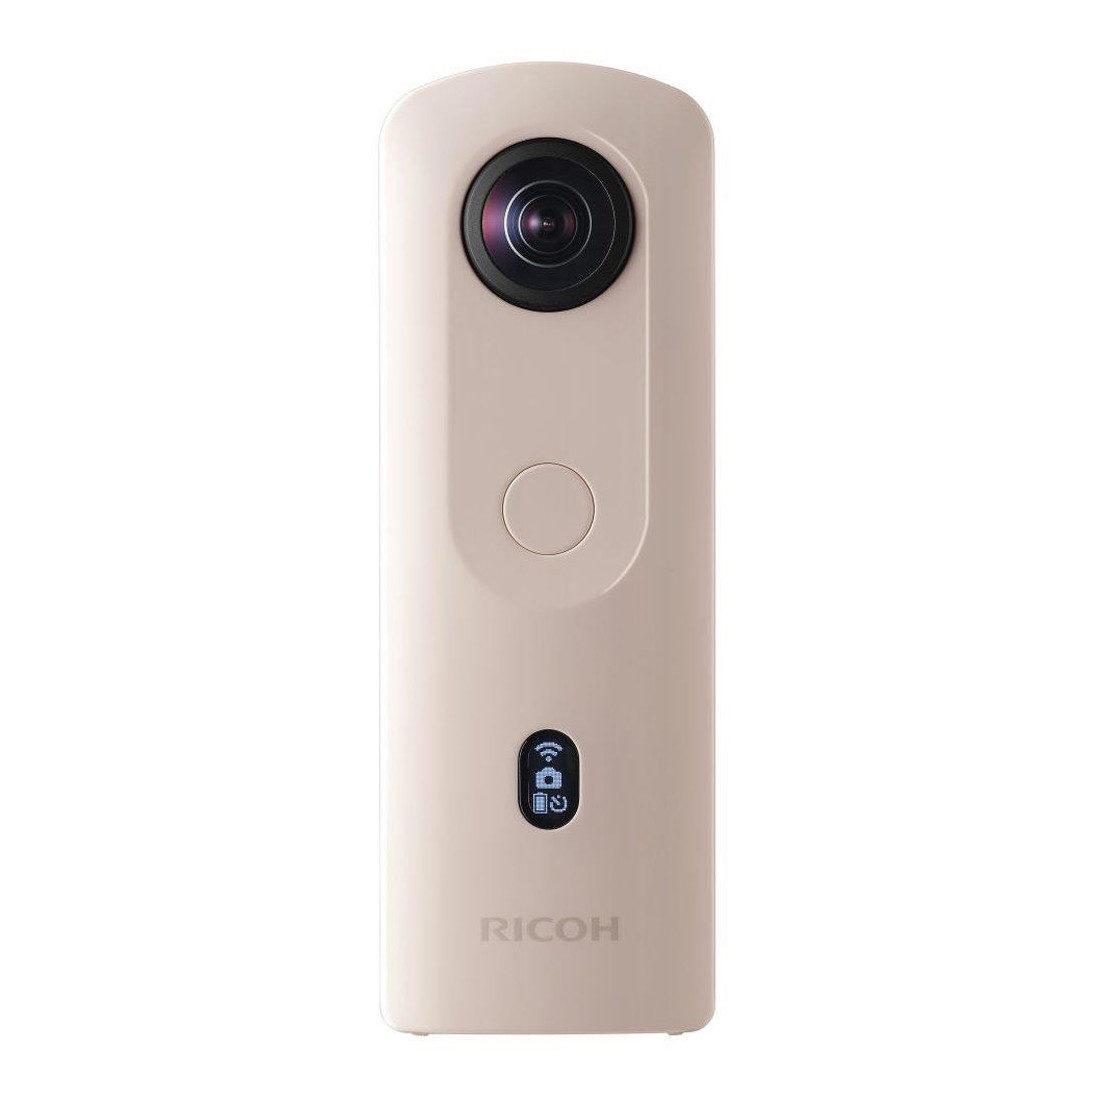 Ricoh Theta SC2 360-graden camera Beige <br/>€ 299.00 <br/> <a href='https://www.cameranu.nl/fotografie/?tt=12190_474631_241358_&r=https%3A%2F%2Fwww.cameranu.nl%2Fnl%2Fp3141837%2Fricoh-theta-sc2-360-graden-camera-beige%3Fchannable%3De10841.MzE0MTgzNw%26utm_campaign%3D%26utm_content%3D360%25C2%25B0%2BTheta%2Bcamera%26utm_source%3DTradetracker%26utm_medium%3Dcpc%26utm_term%3DDigitale%2Bcamera%26apos%3Bs' target='_blank'>naar de winkel</a>